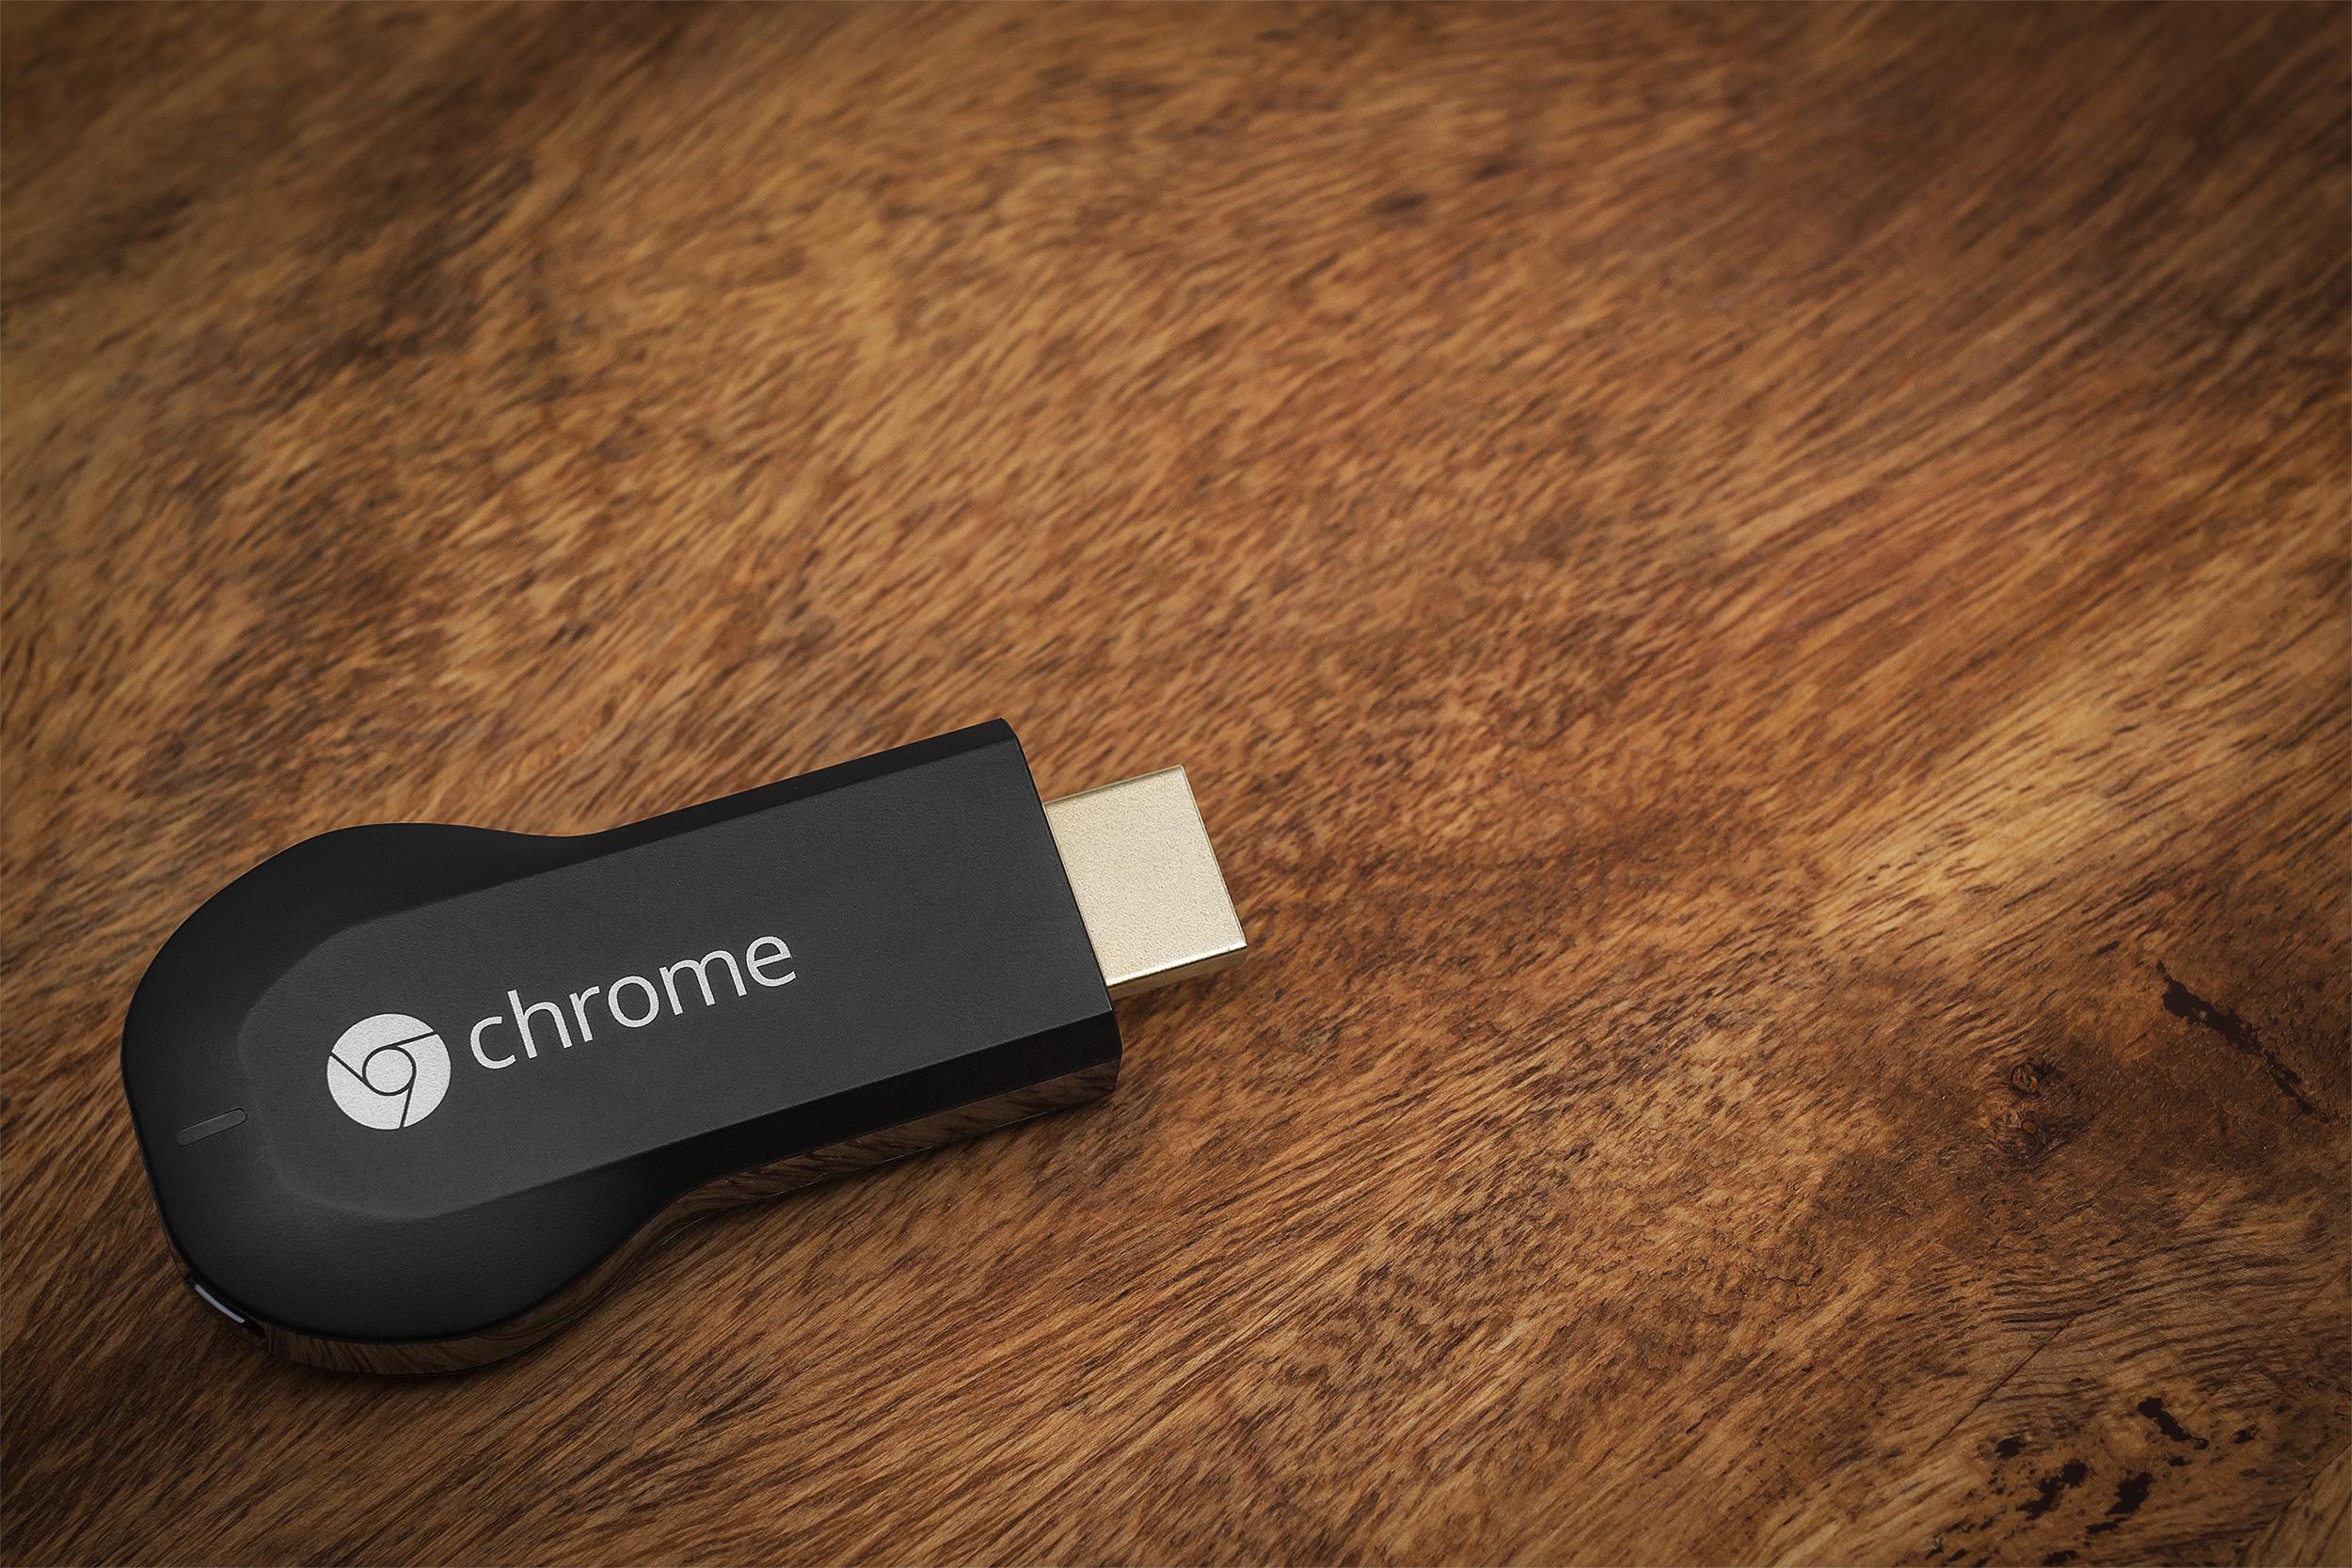 Google Chromecast Generic